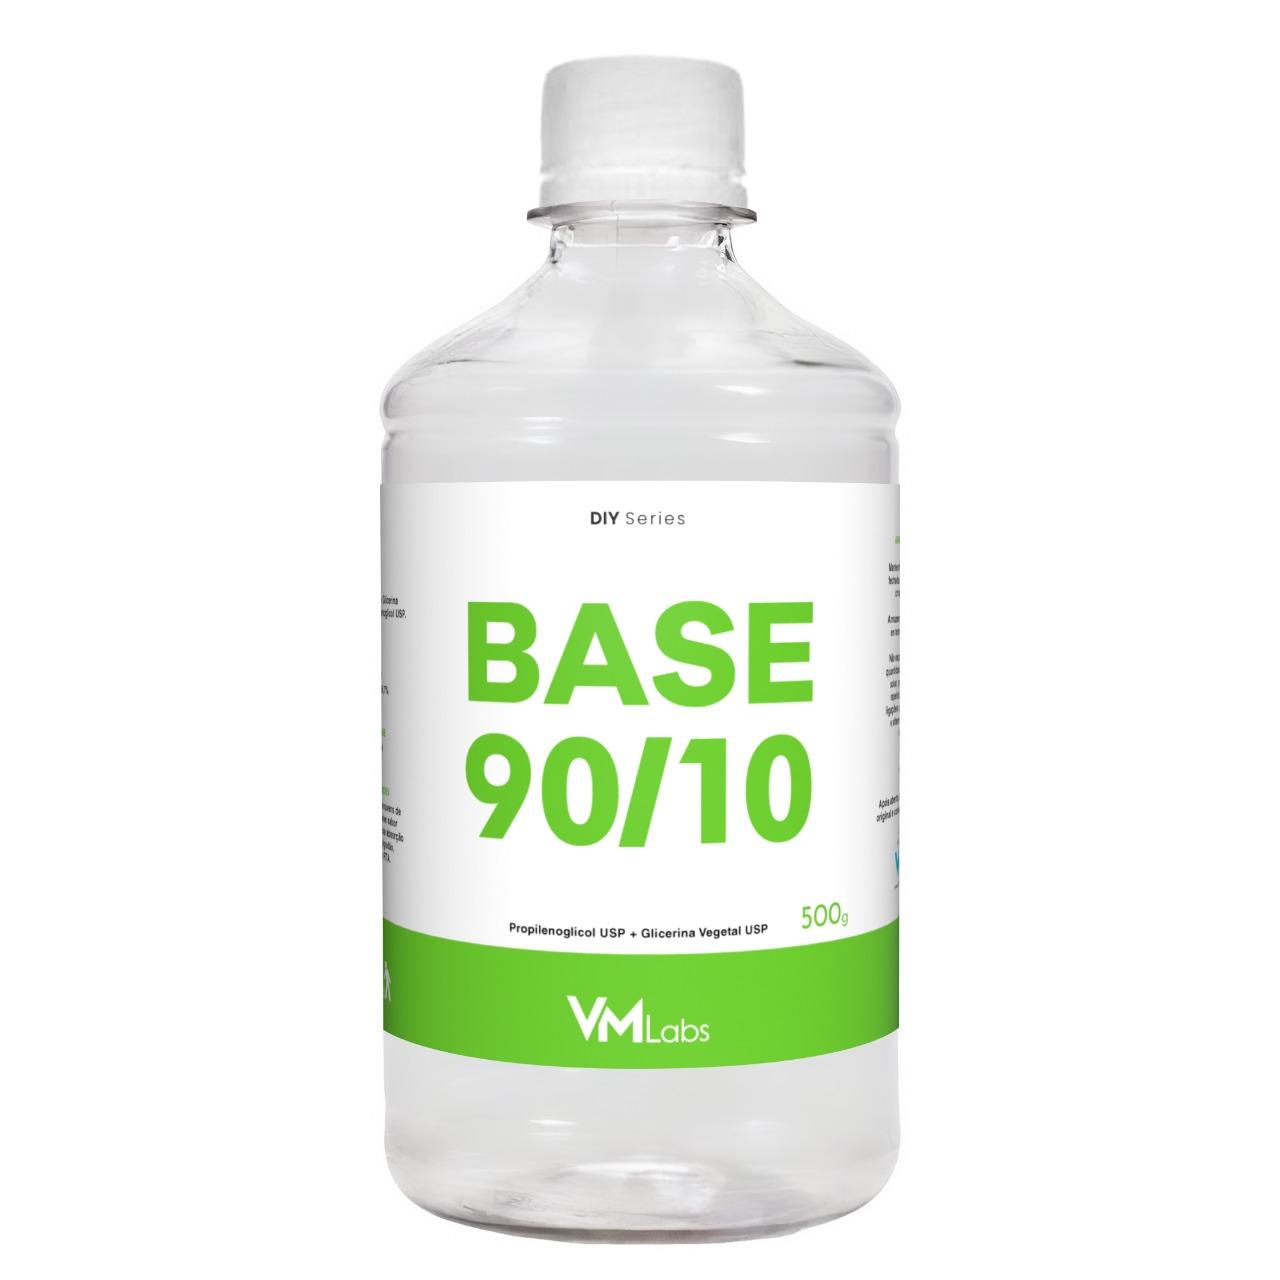 Base Pronta USP 90/10 - 500ml